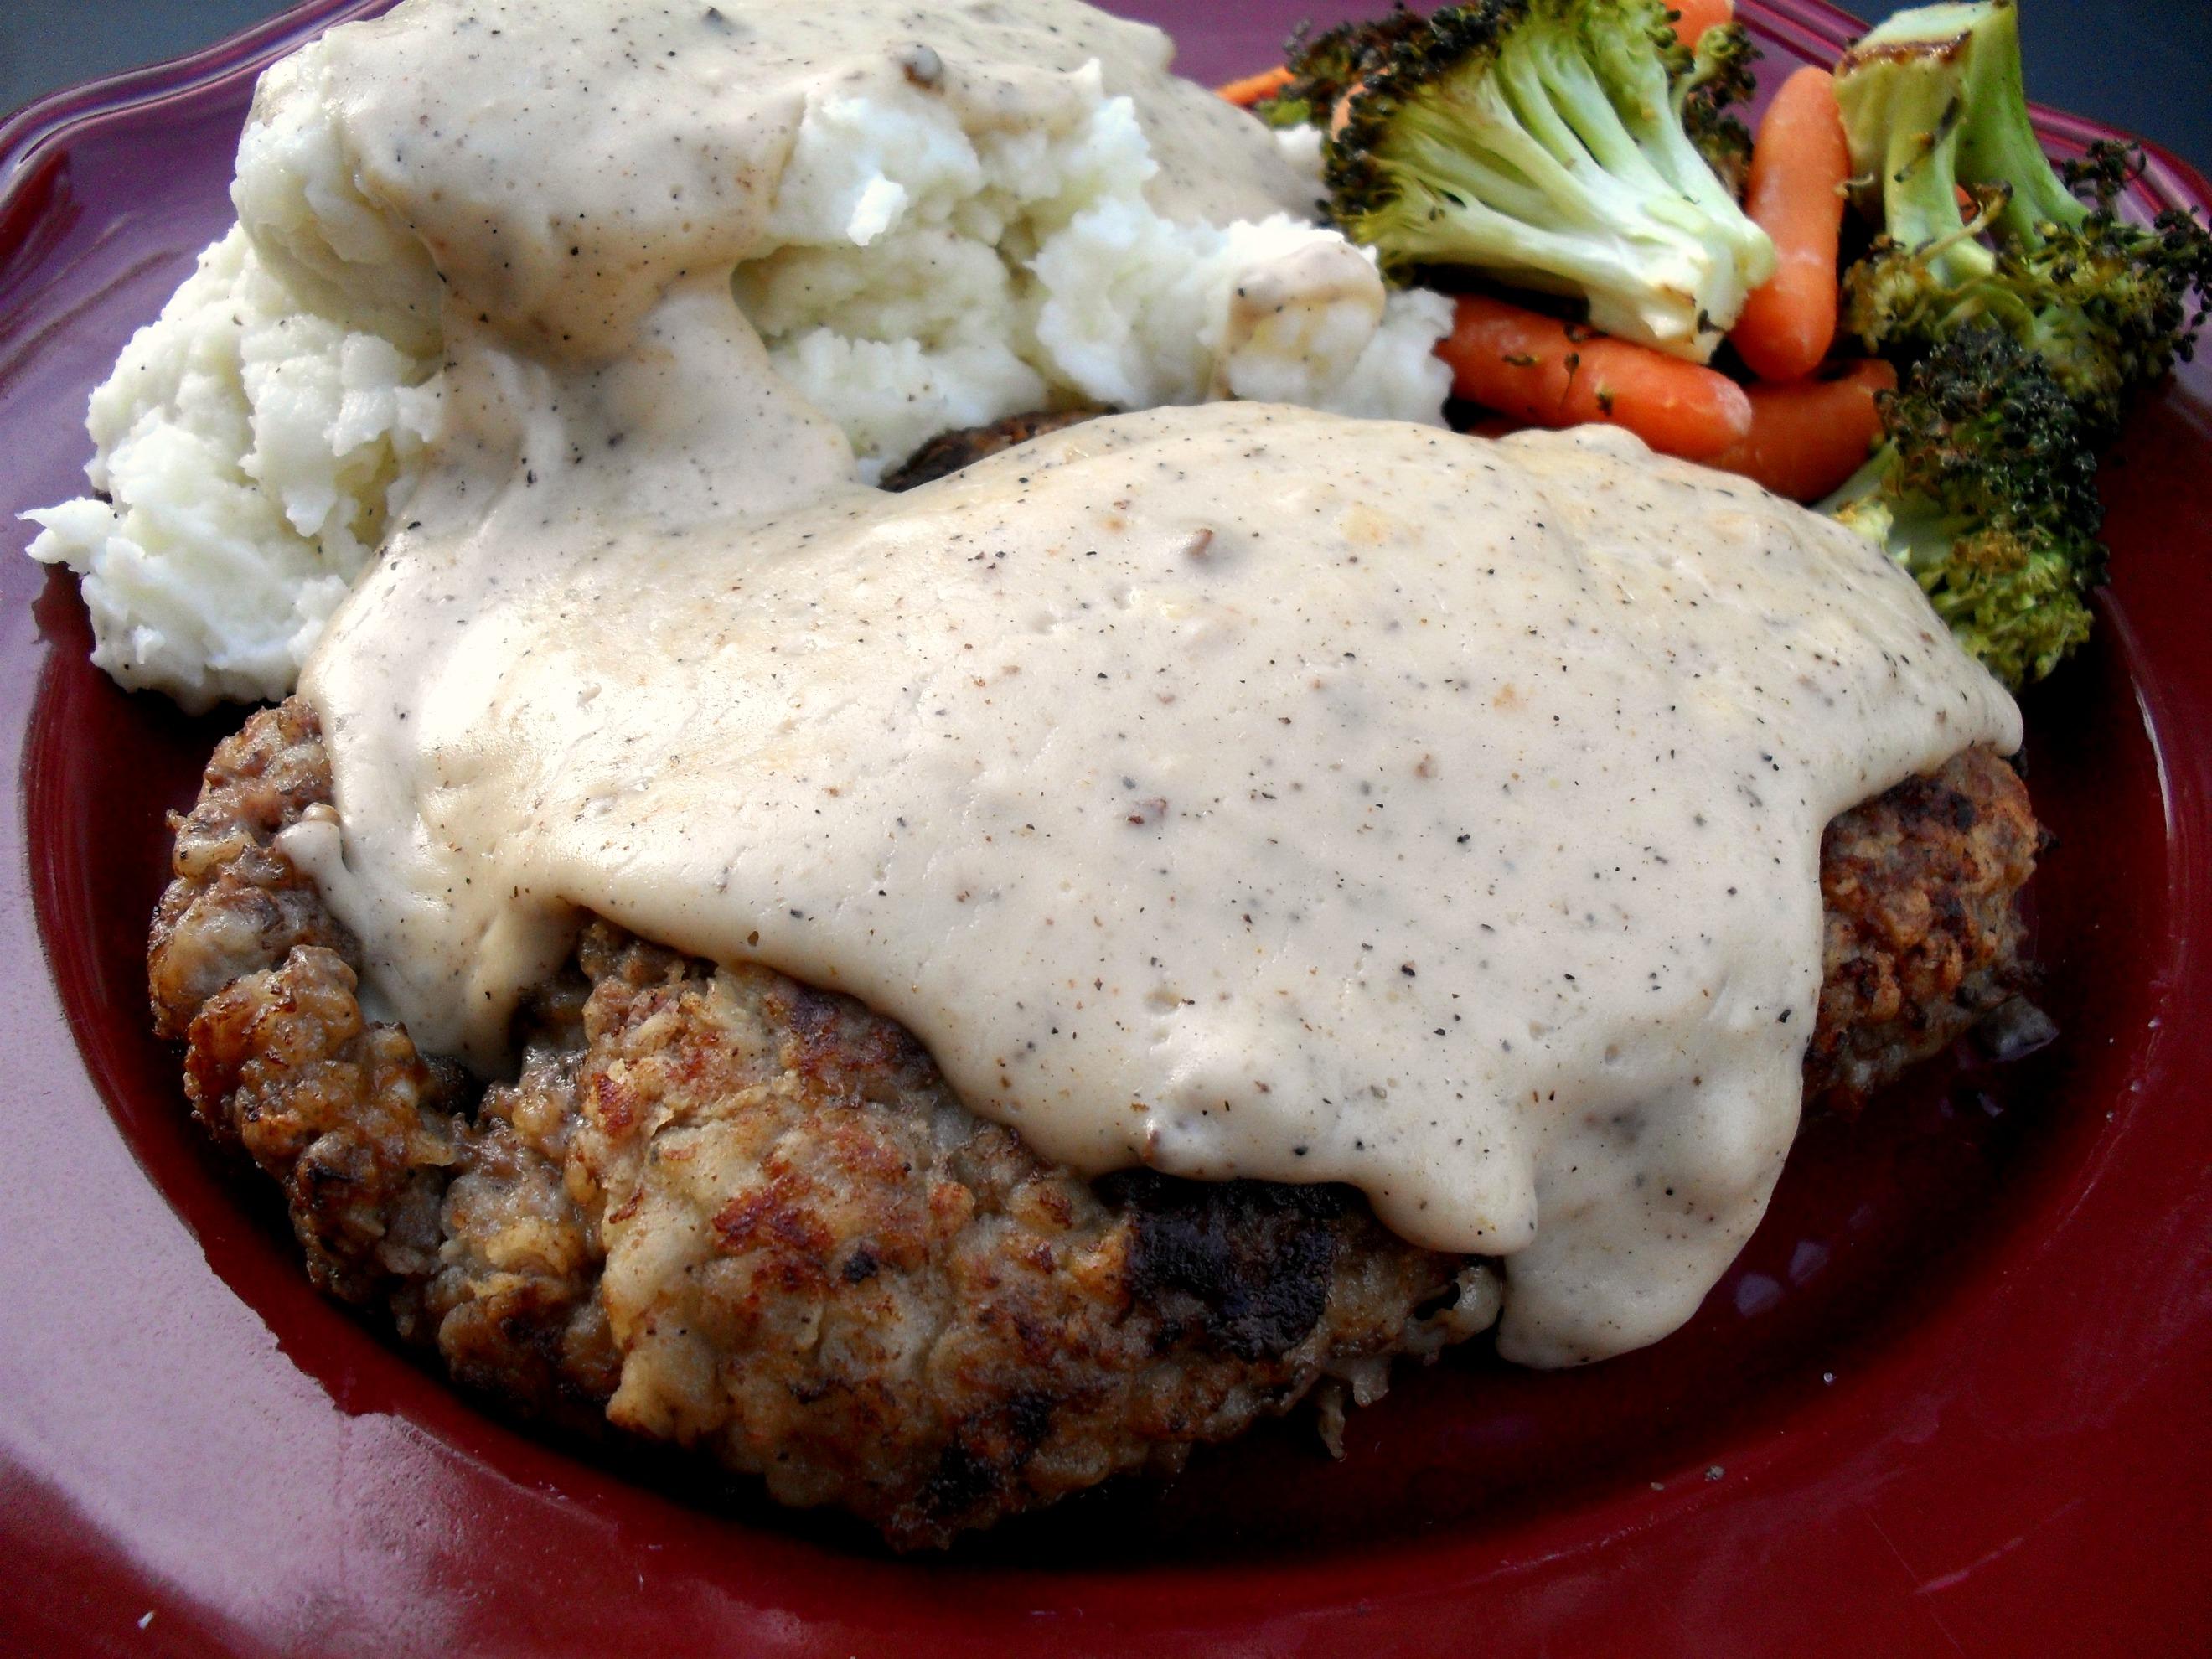 Chicken-Fried Steak with Country Gravy | Veronica's Cornucopia